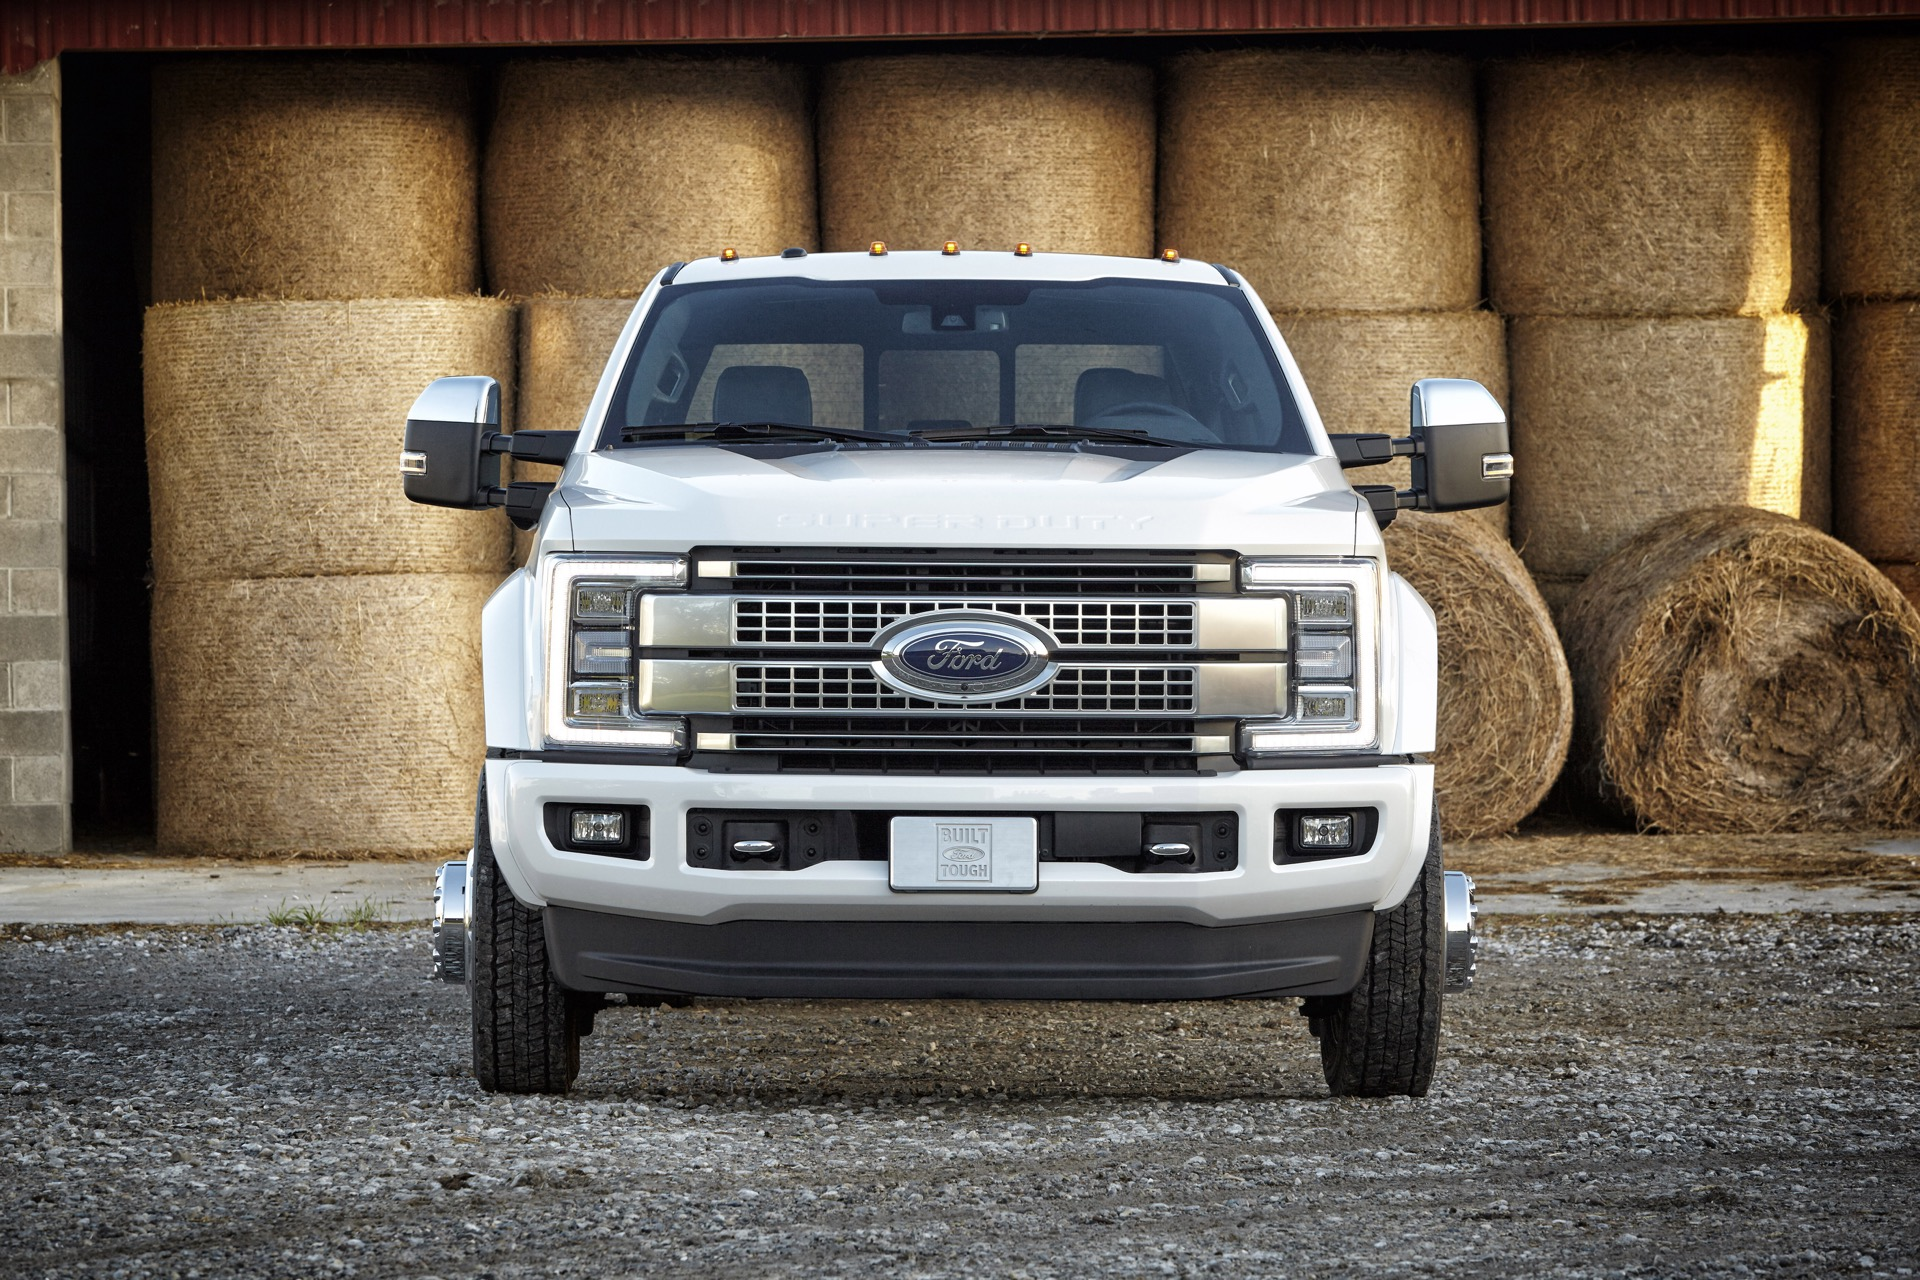 2017 Ford Super Duty Trucks Go Aluminum But Keep Big V-8, V-10 Engines